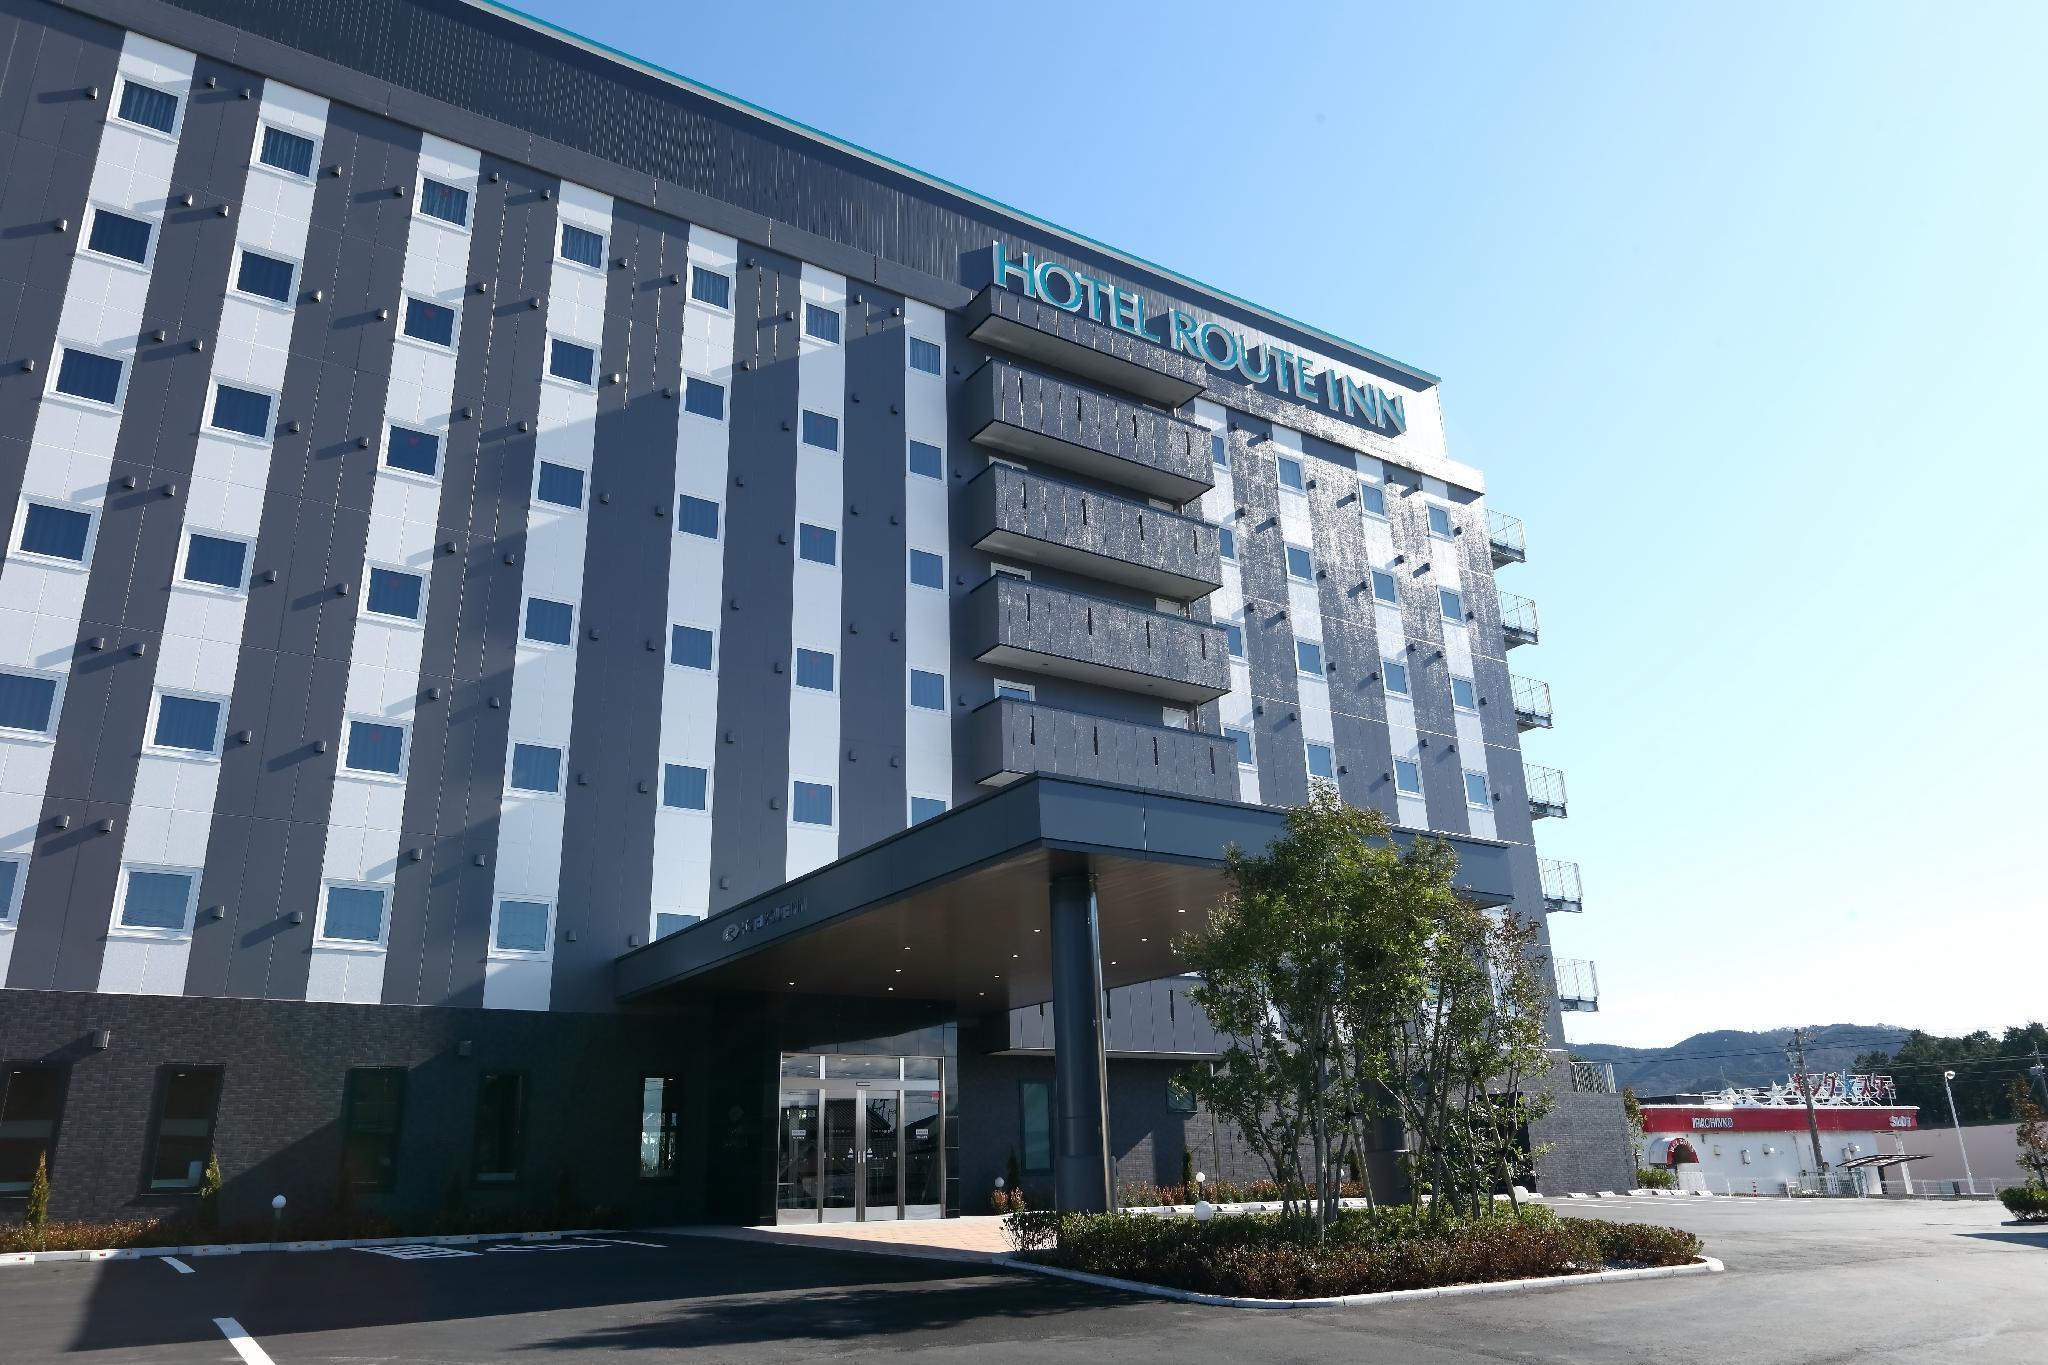 Hotel Route Inn Shinshiro